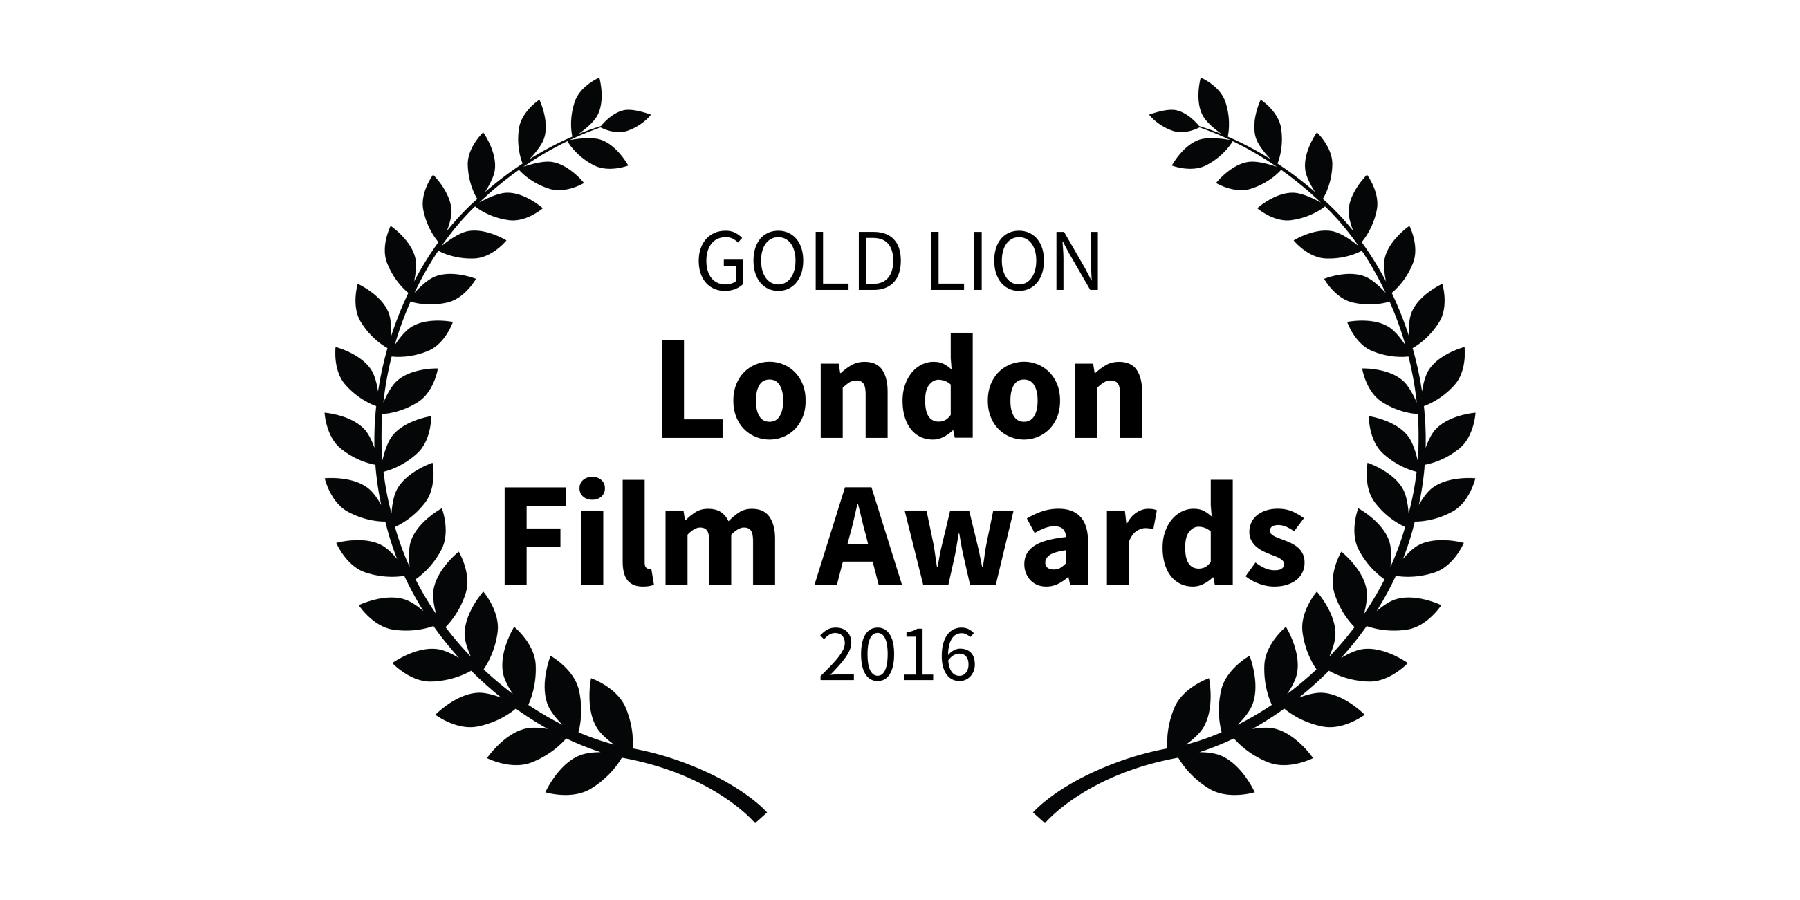 LONDON_GOLD_LION-01.jpg